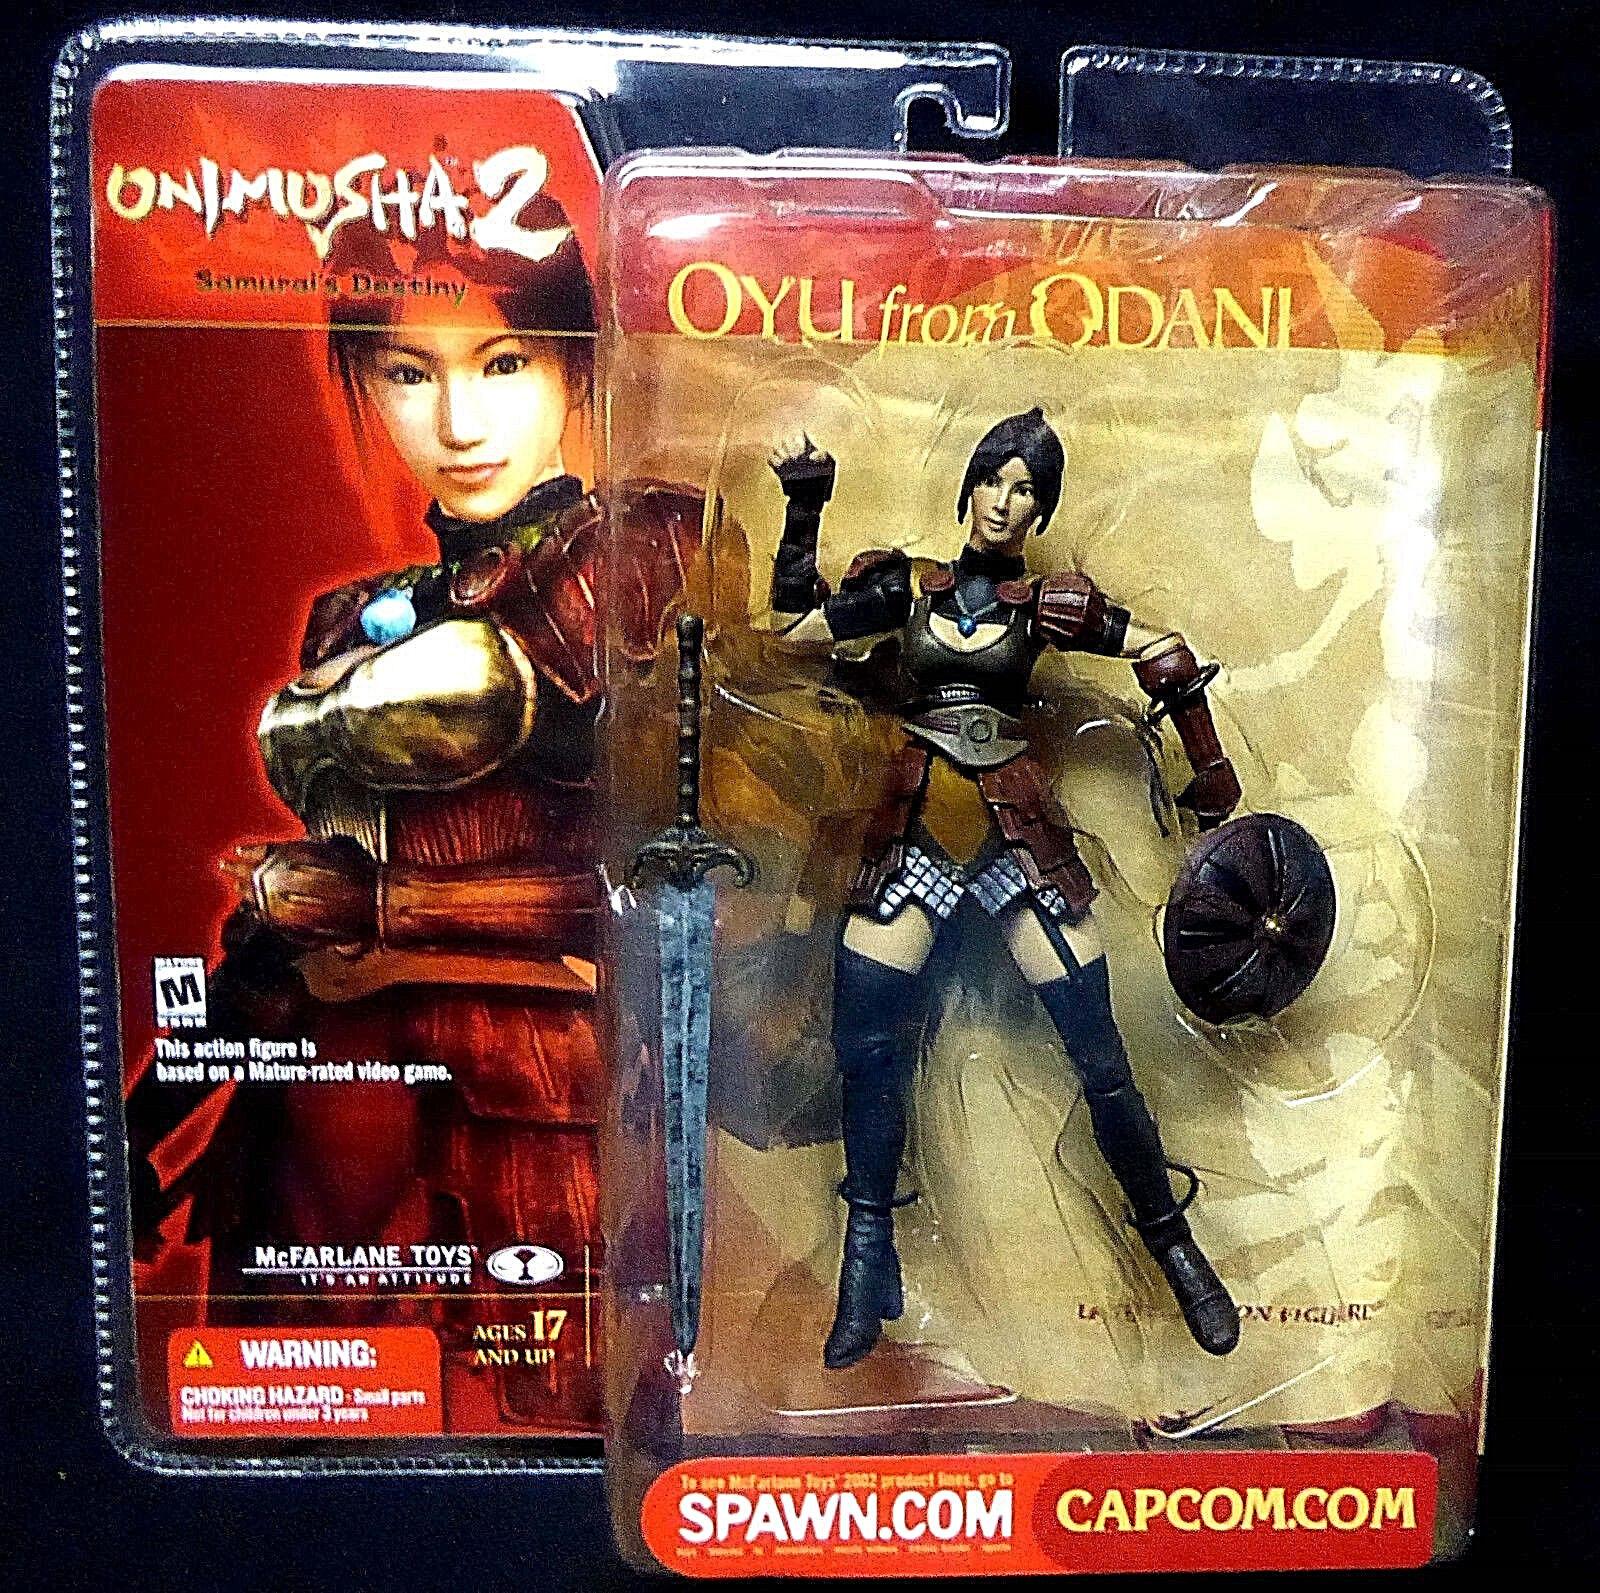 Onimusha 2 Samurai's Destiny Oyu from Odani  Figure McFarlane Toys New 2002